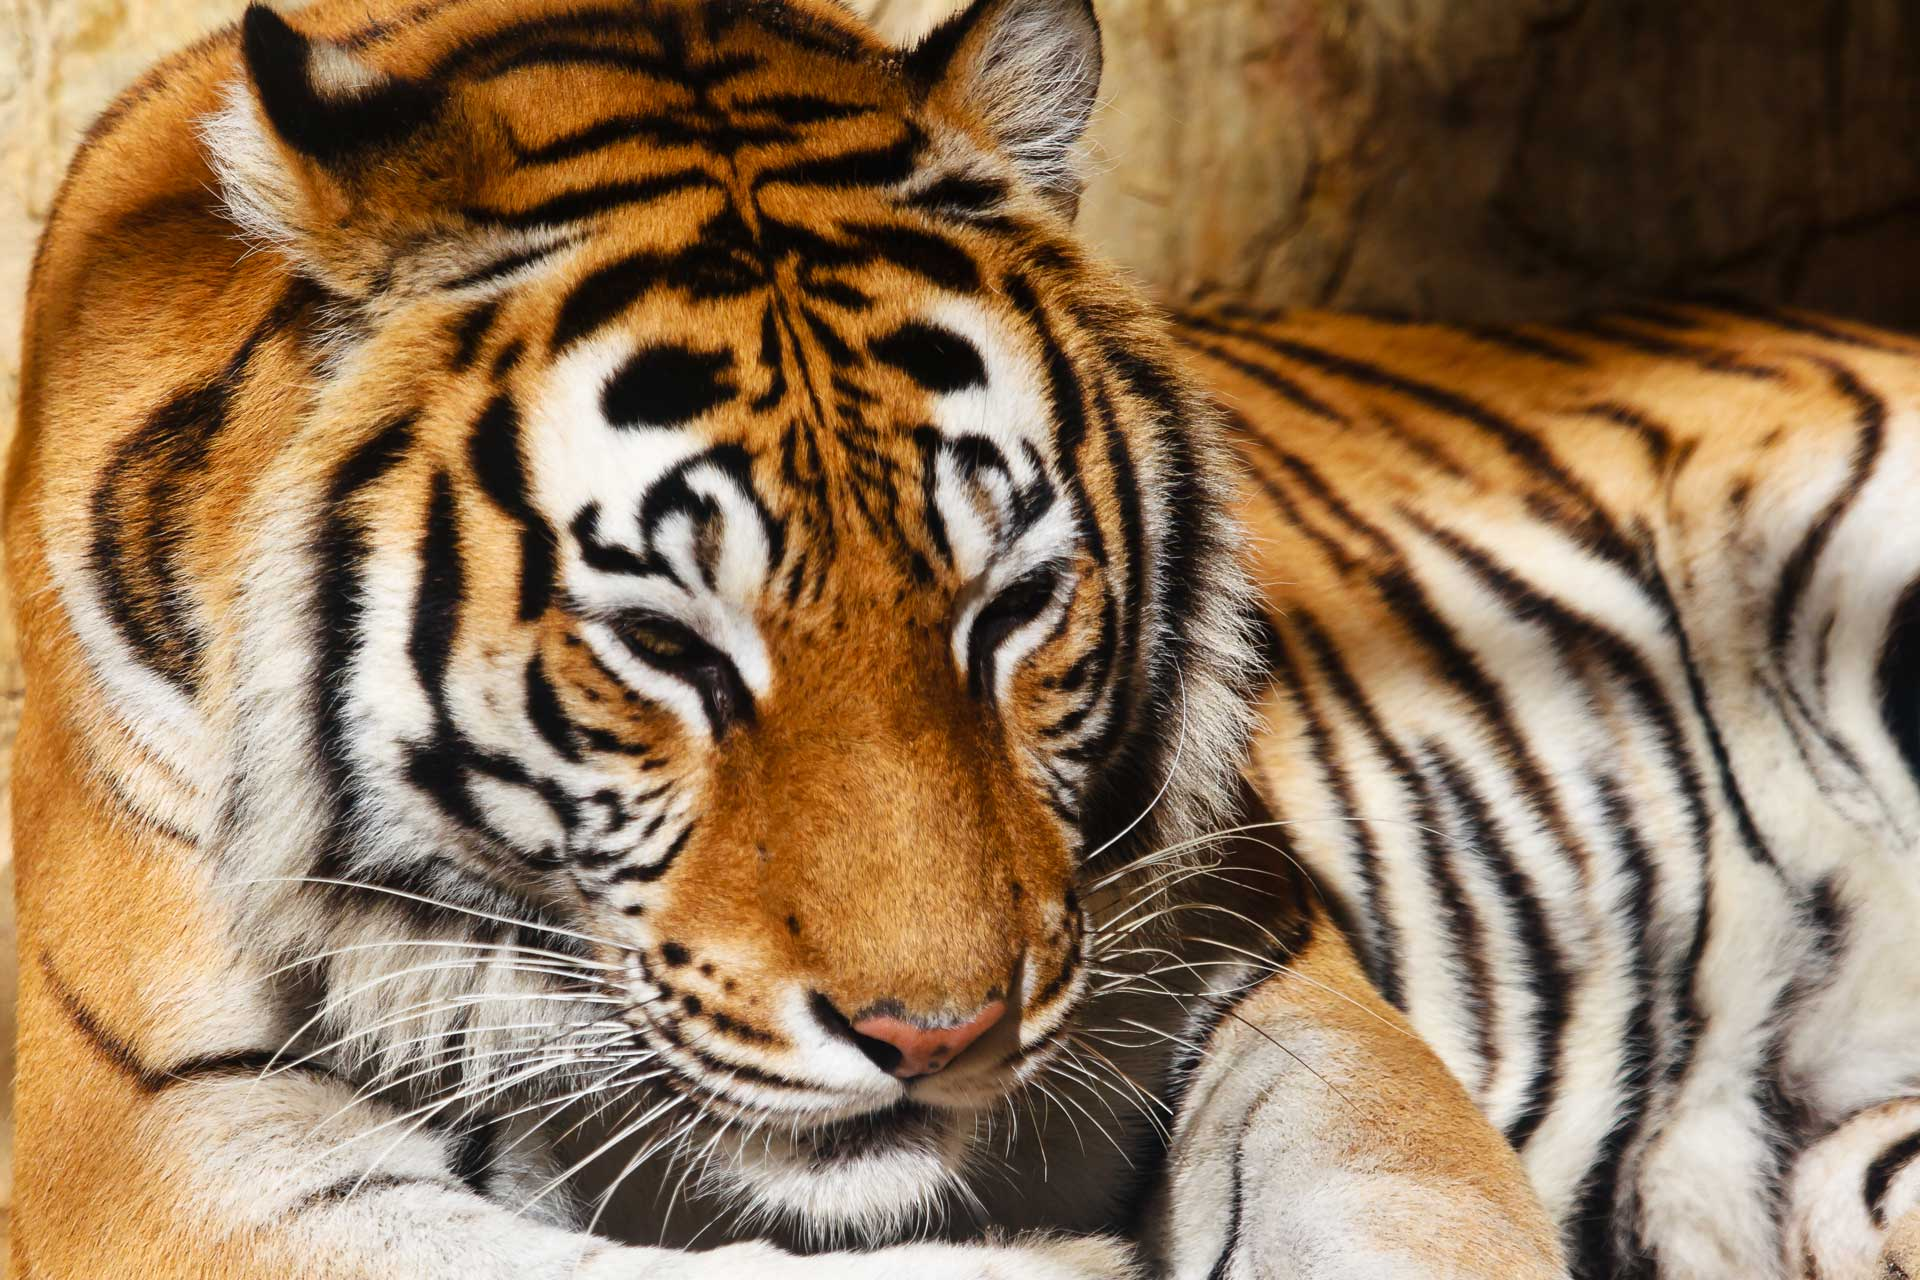 bengal-tiger-P66PJ24.jpg